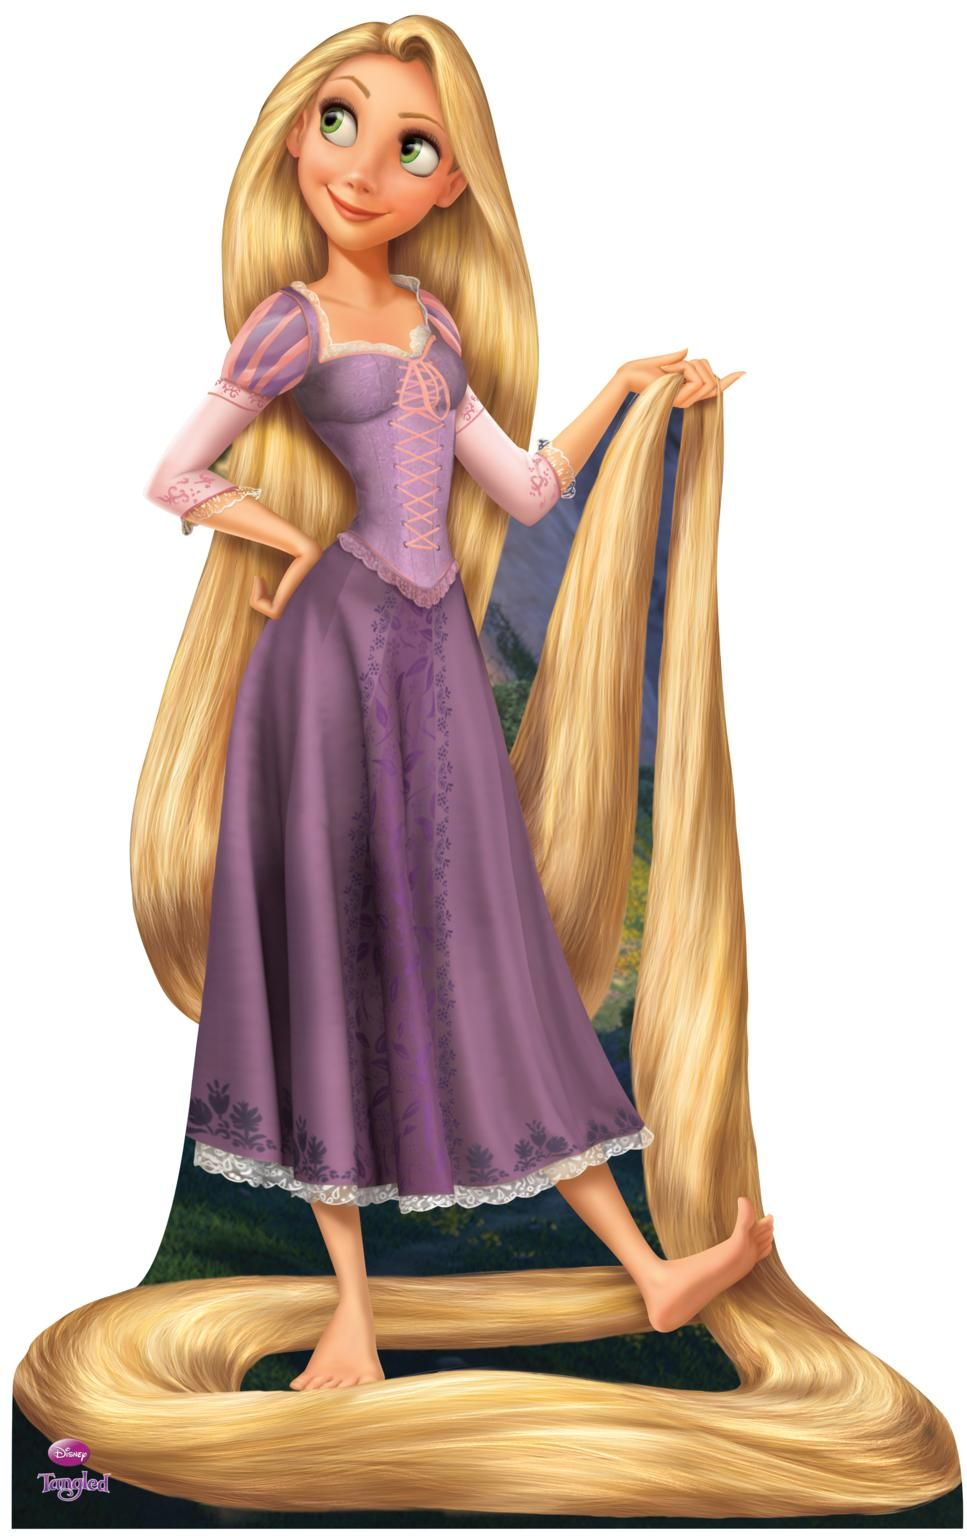 Printable Rapunzel Image Google Search ディズニーラプンツェル